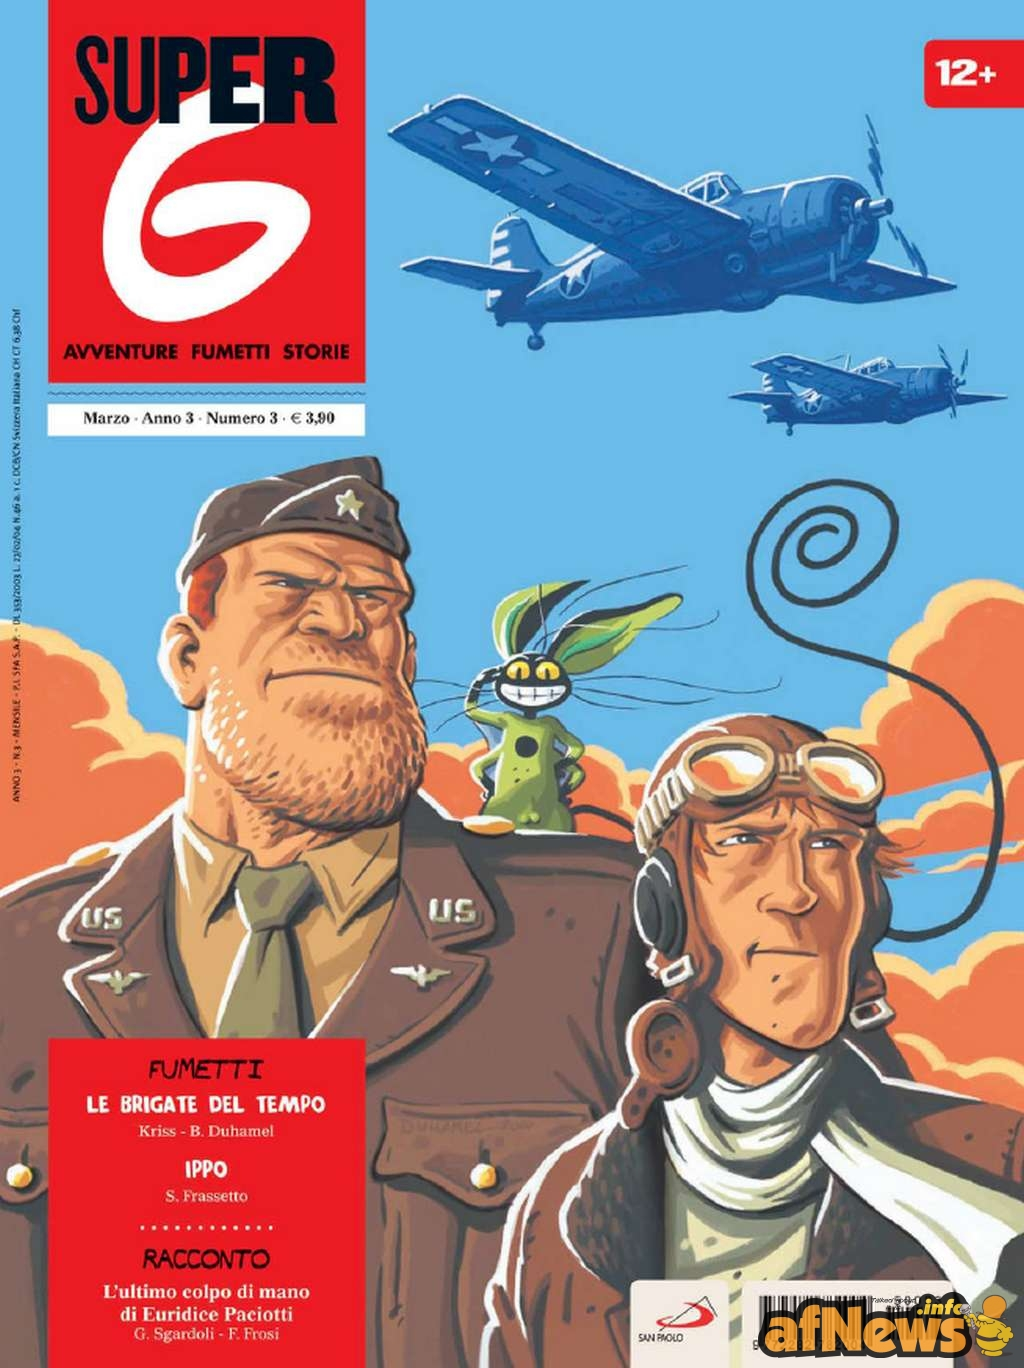 SuperG 2015 3 cover